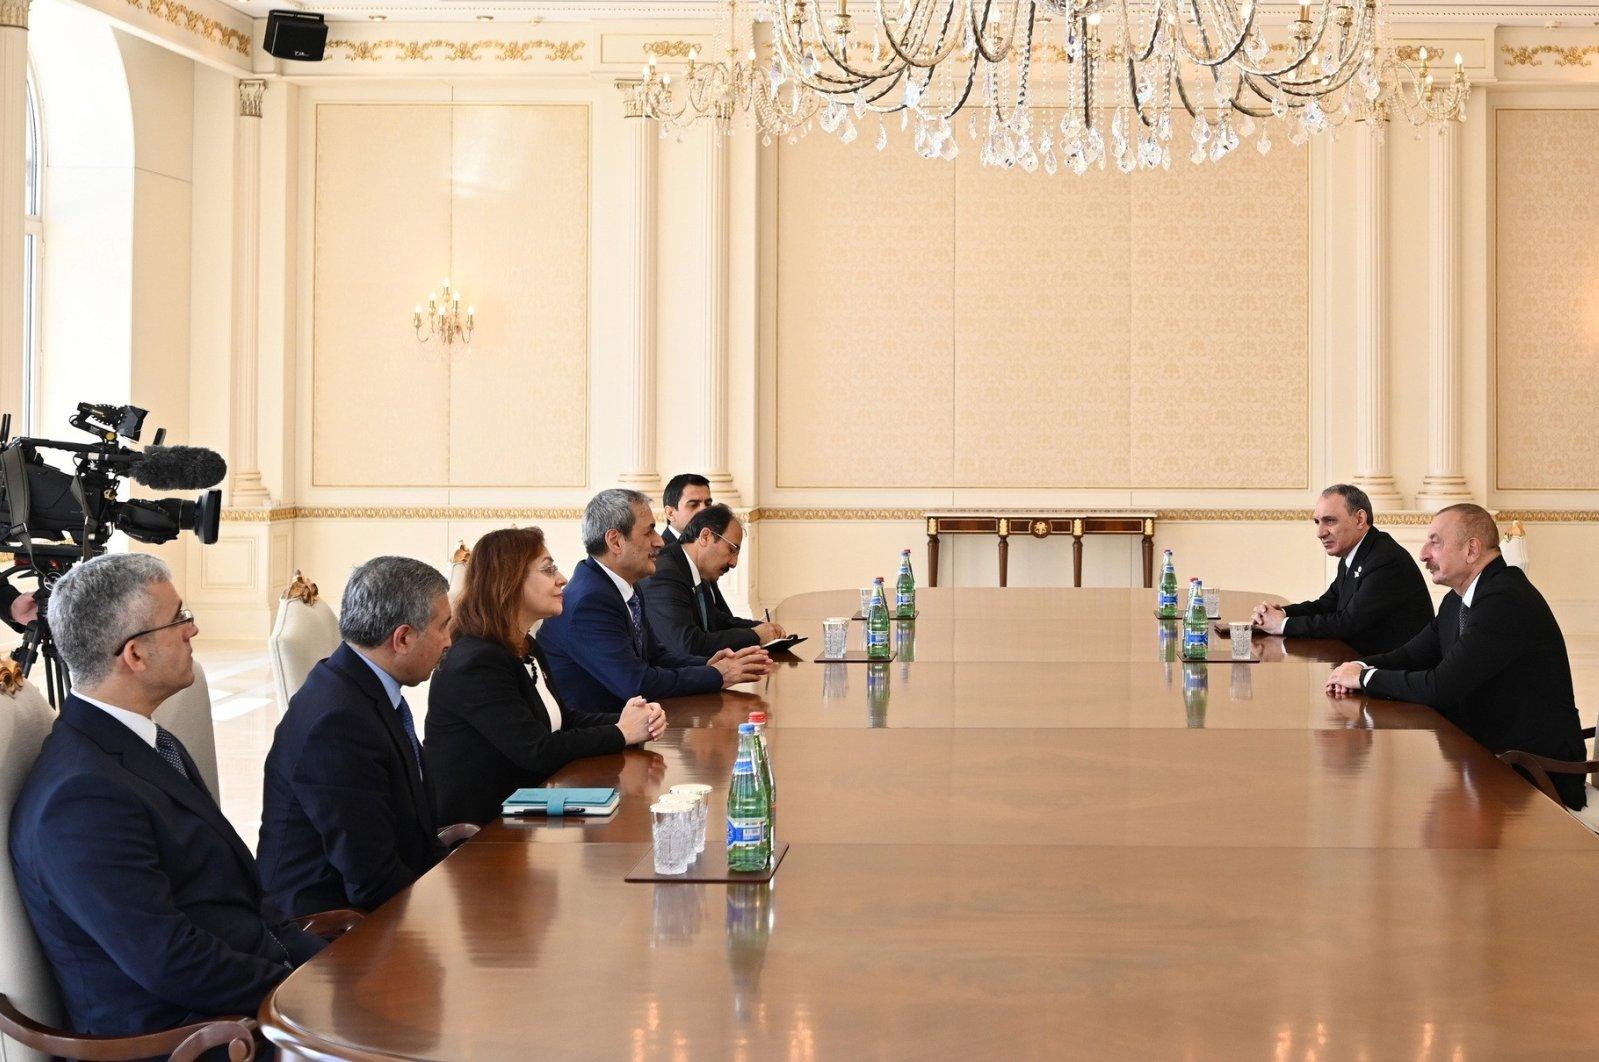 Bekir Şahin, Turkish chief public prosecutor of the supreme court of appeals, was received by Azerbaijan's President Ilham Aliyev in Baku, Azerbaijan, May 30, 2021 (IHA Photo)